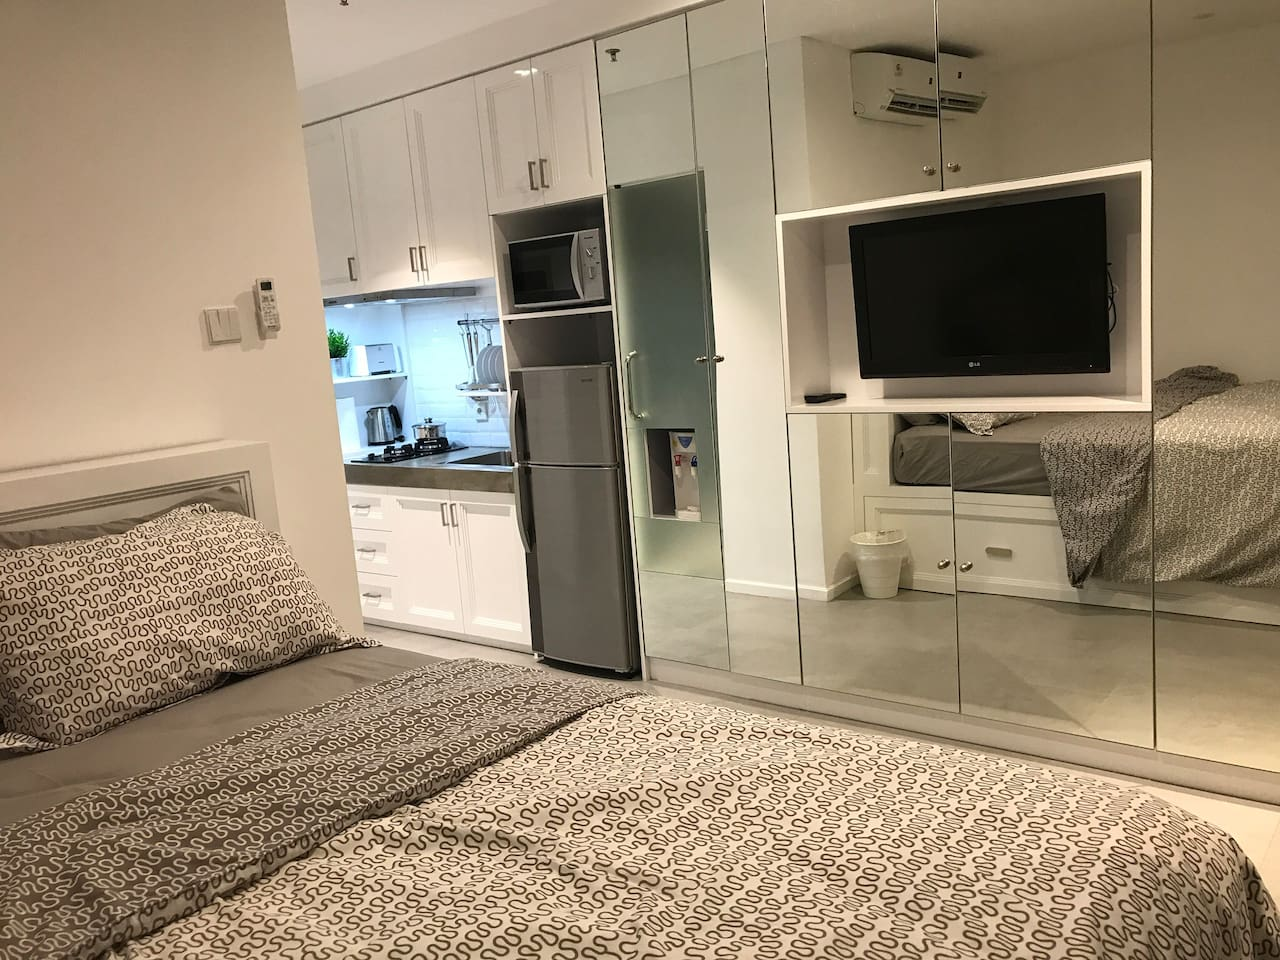 Luxurious, comfortable & clean studio.